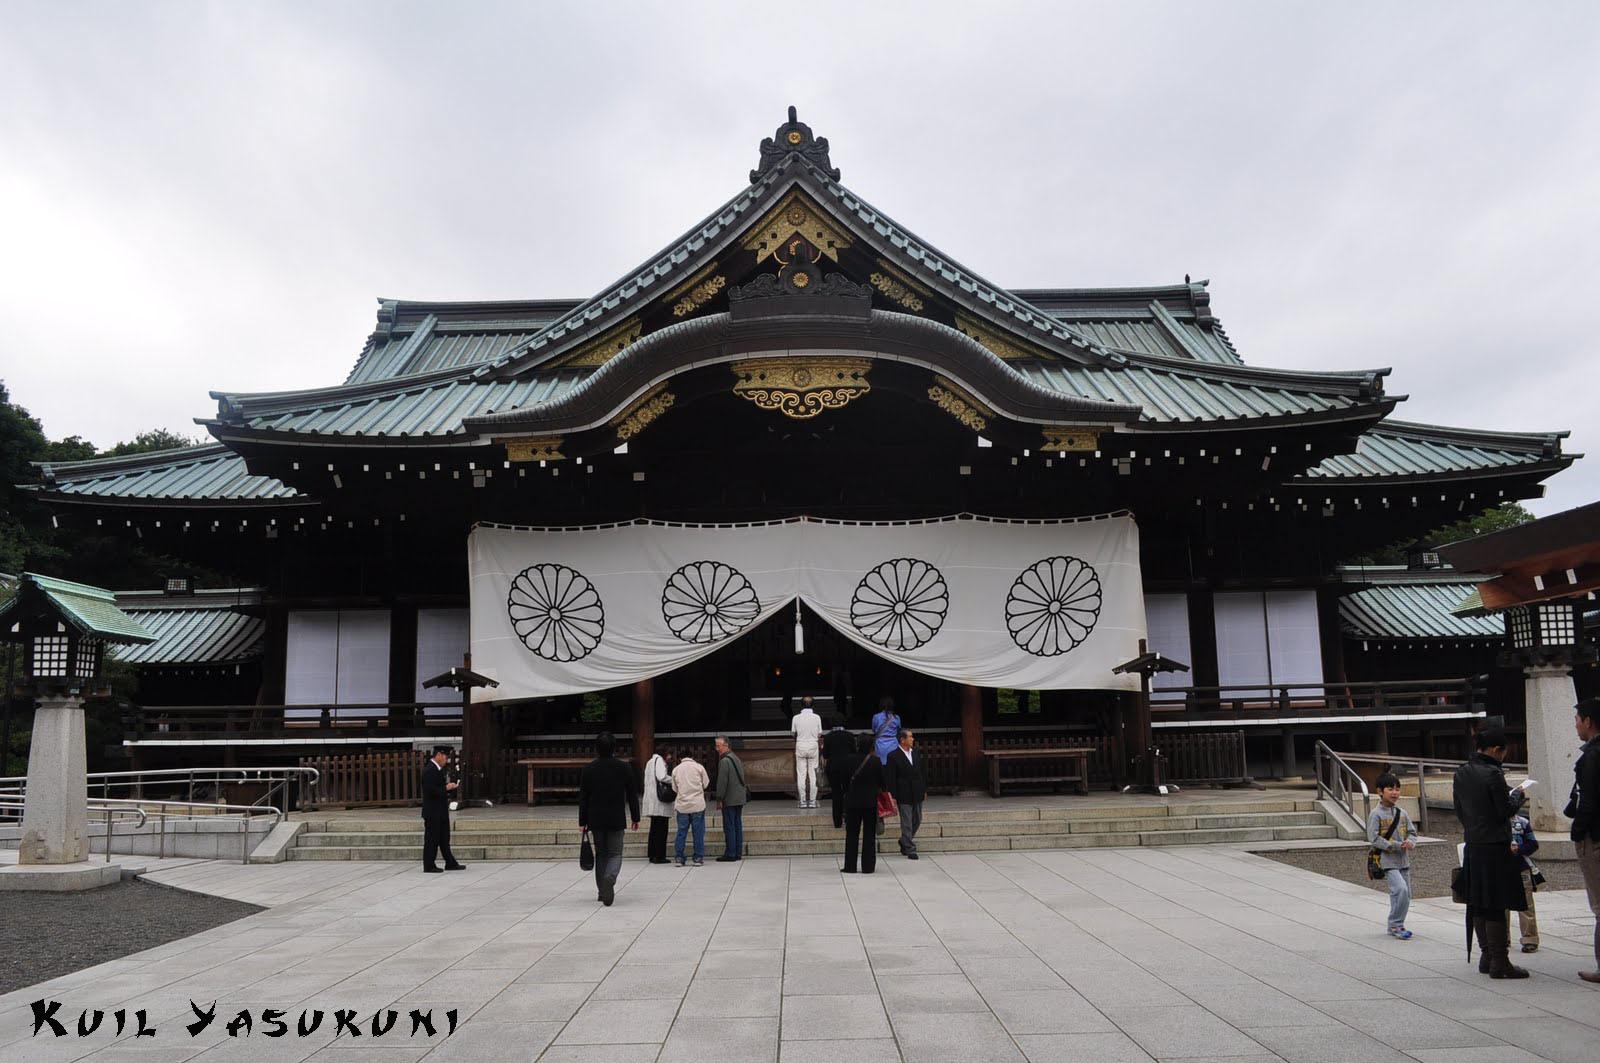 Kuil Yasukuni